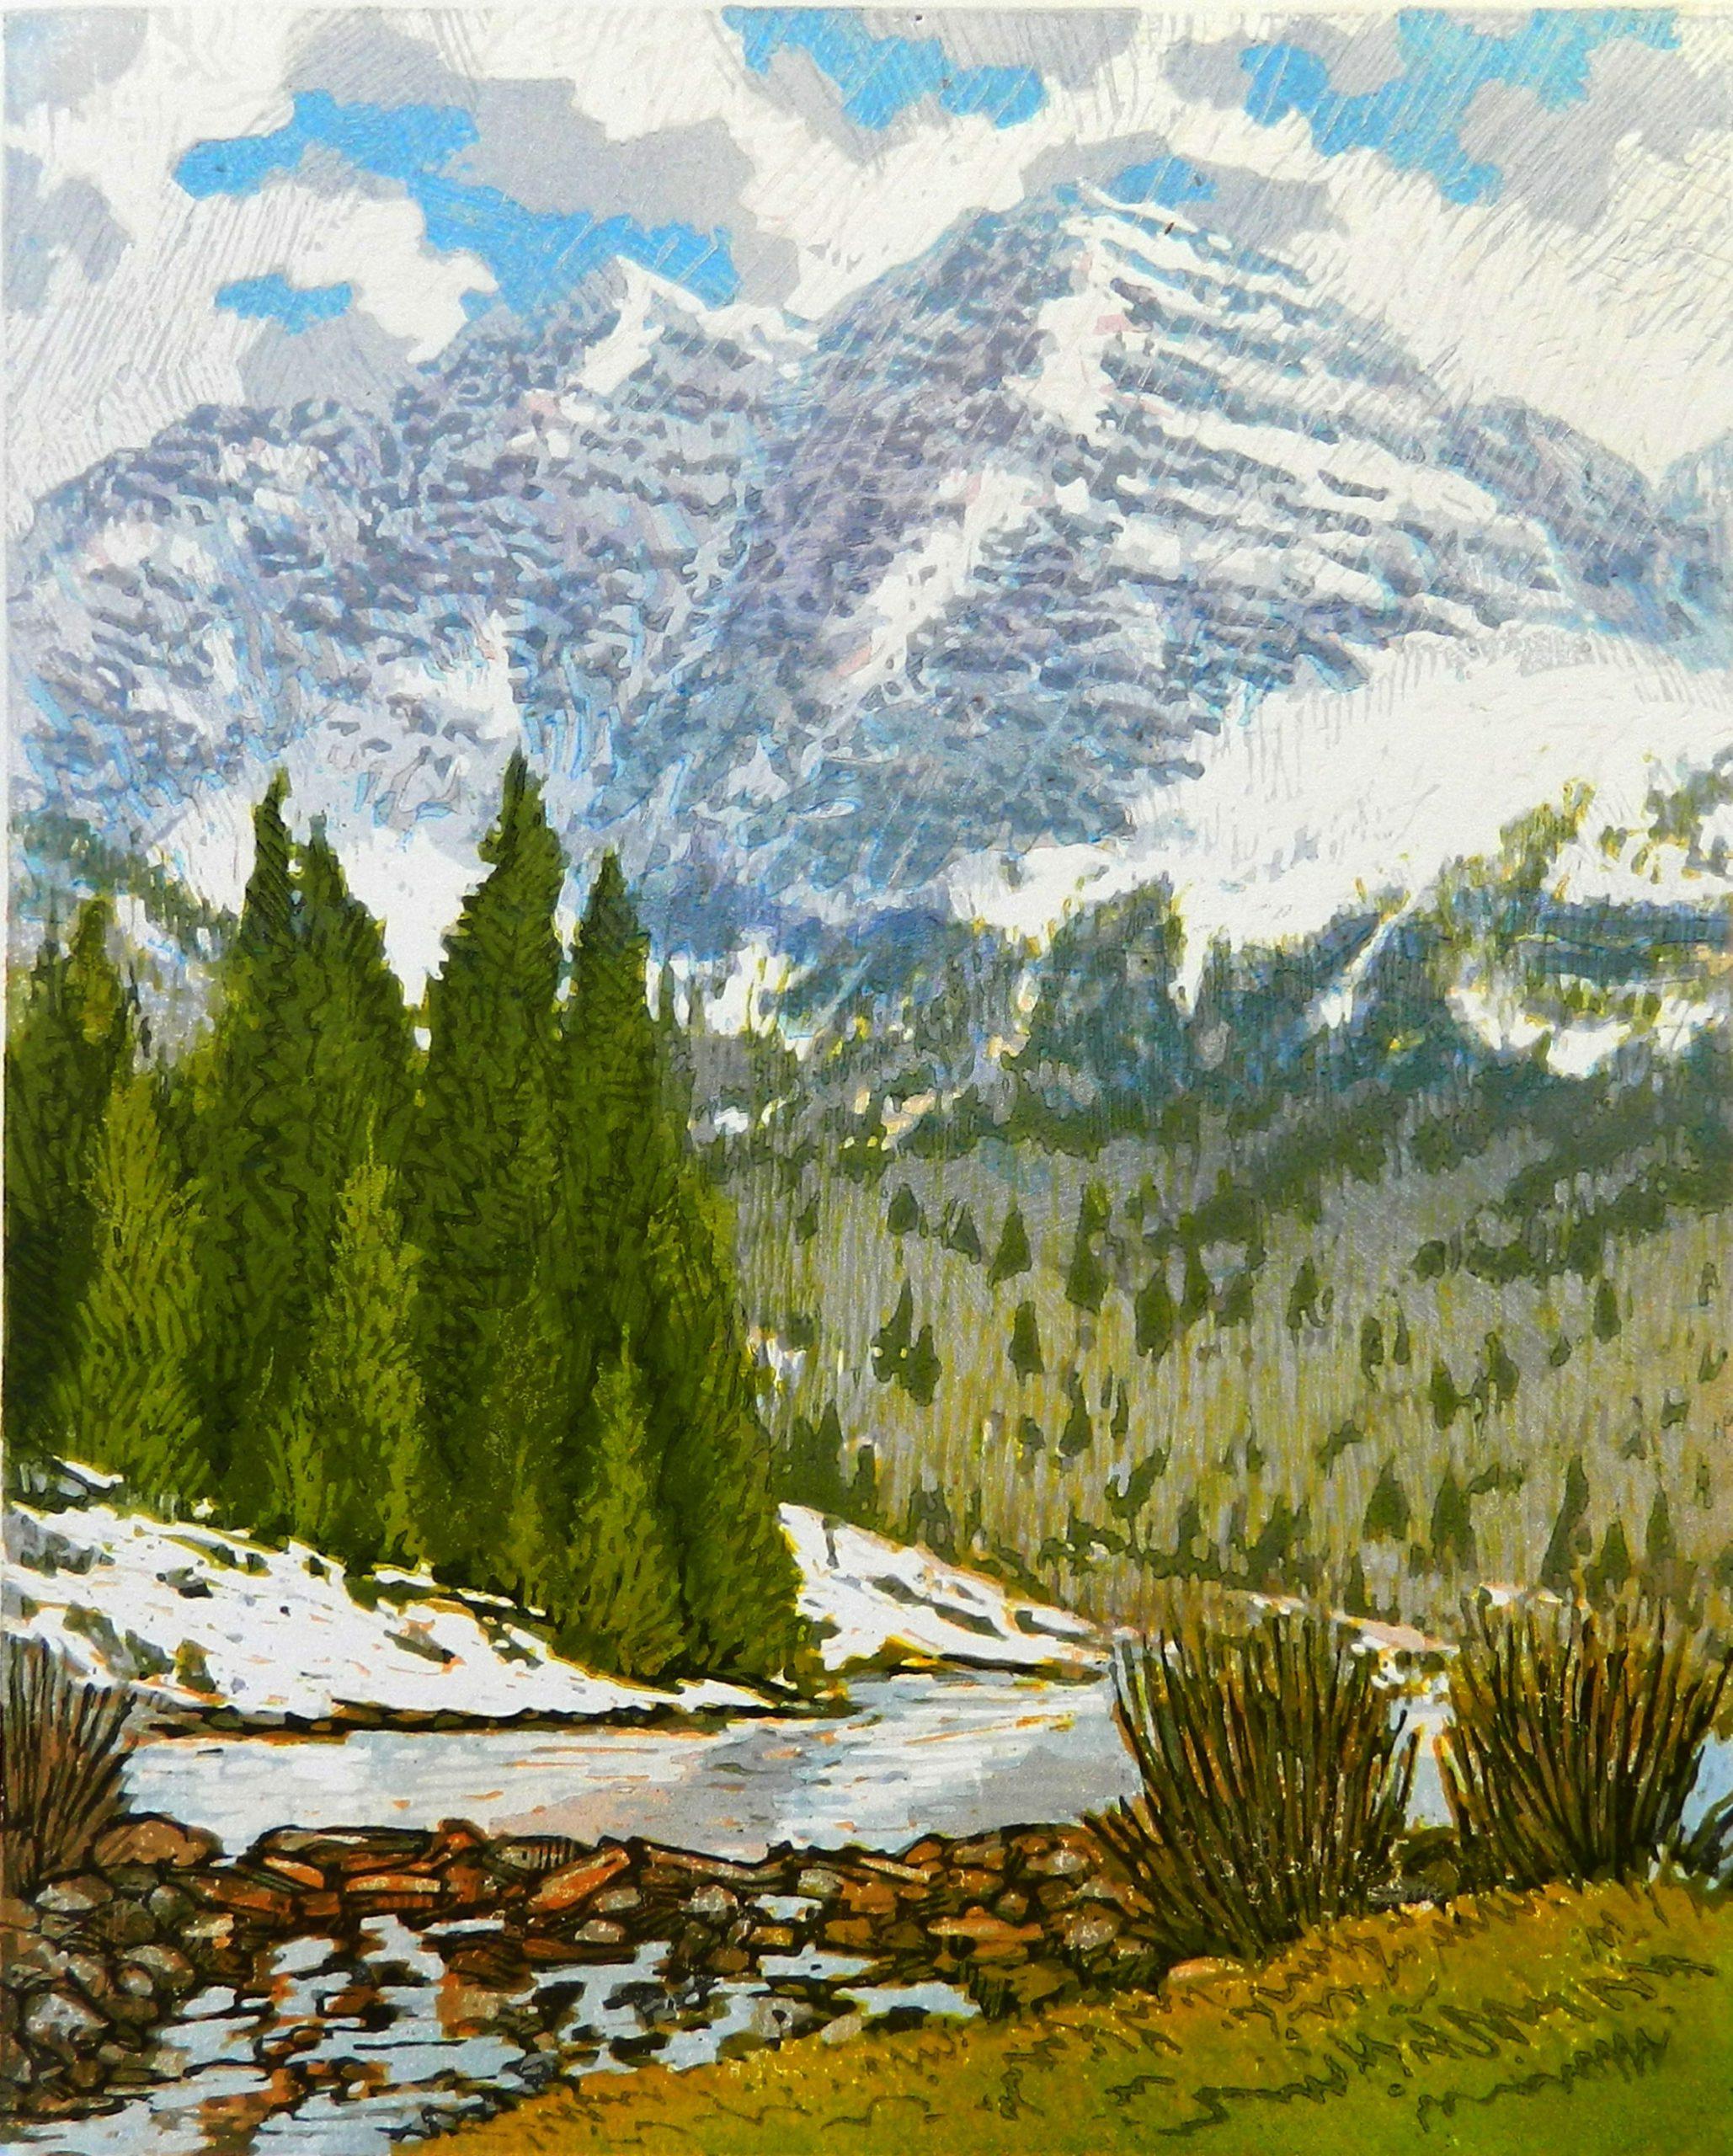 Leon Loughridge - Spring flurries, Maroon Bells - 6/28